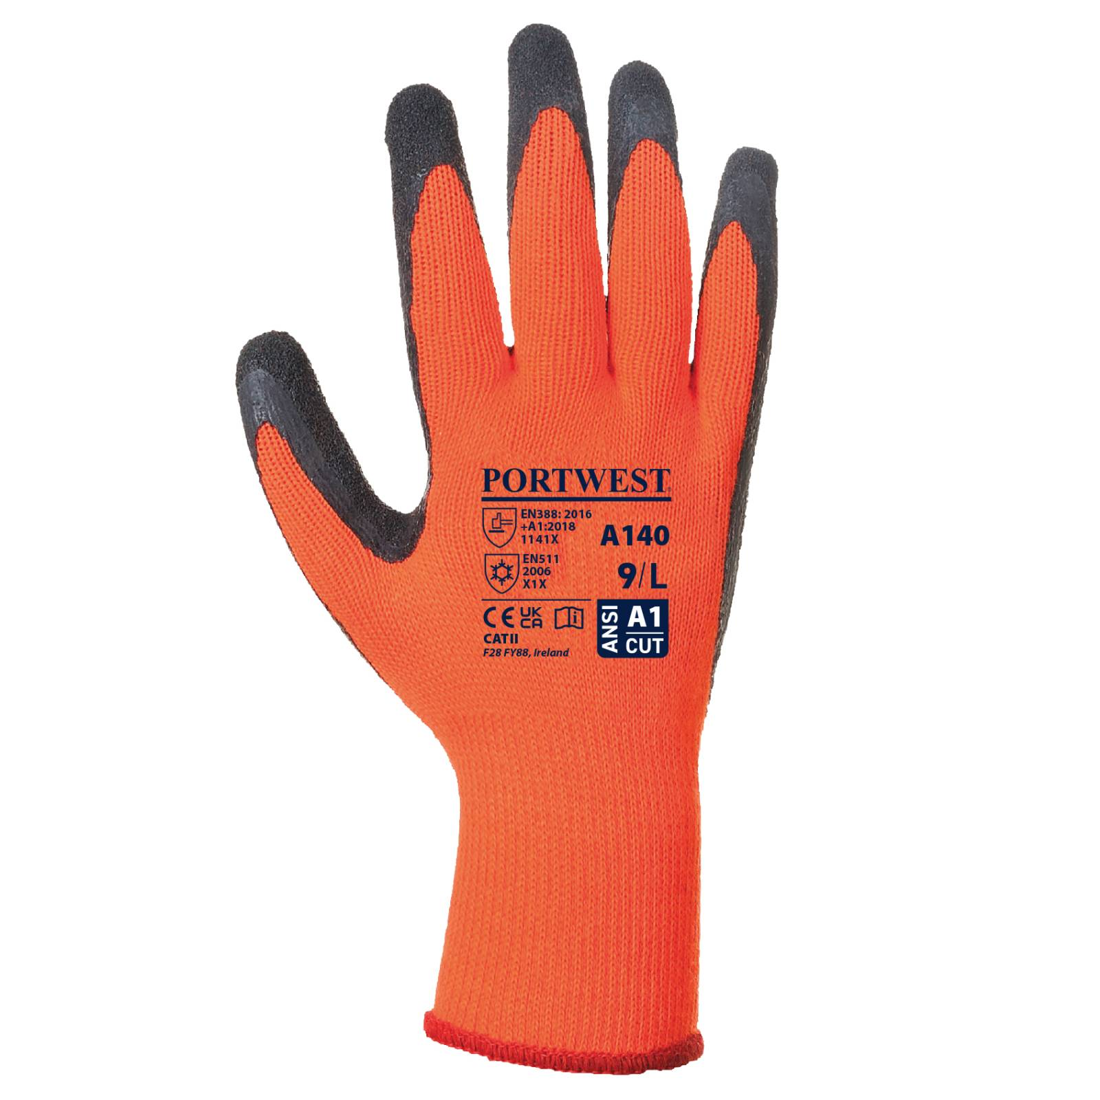 Portwest Handschoenen A140 oranje-zwart(OR)